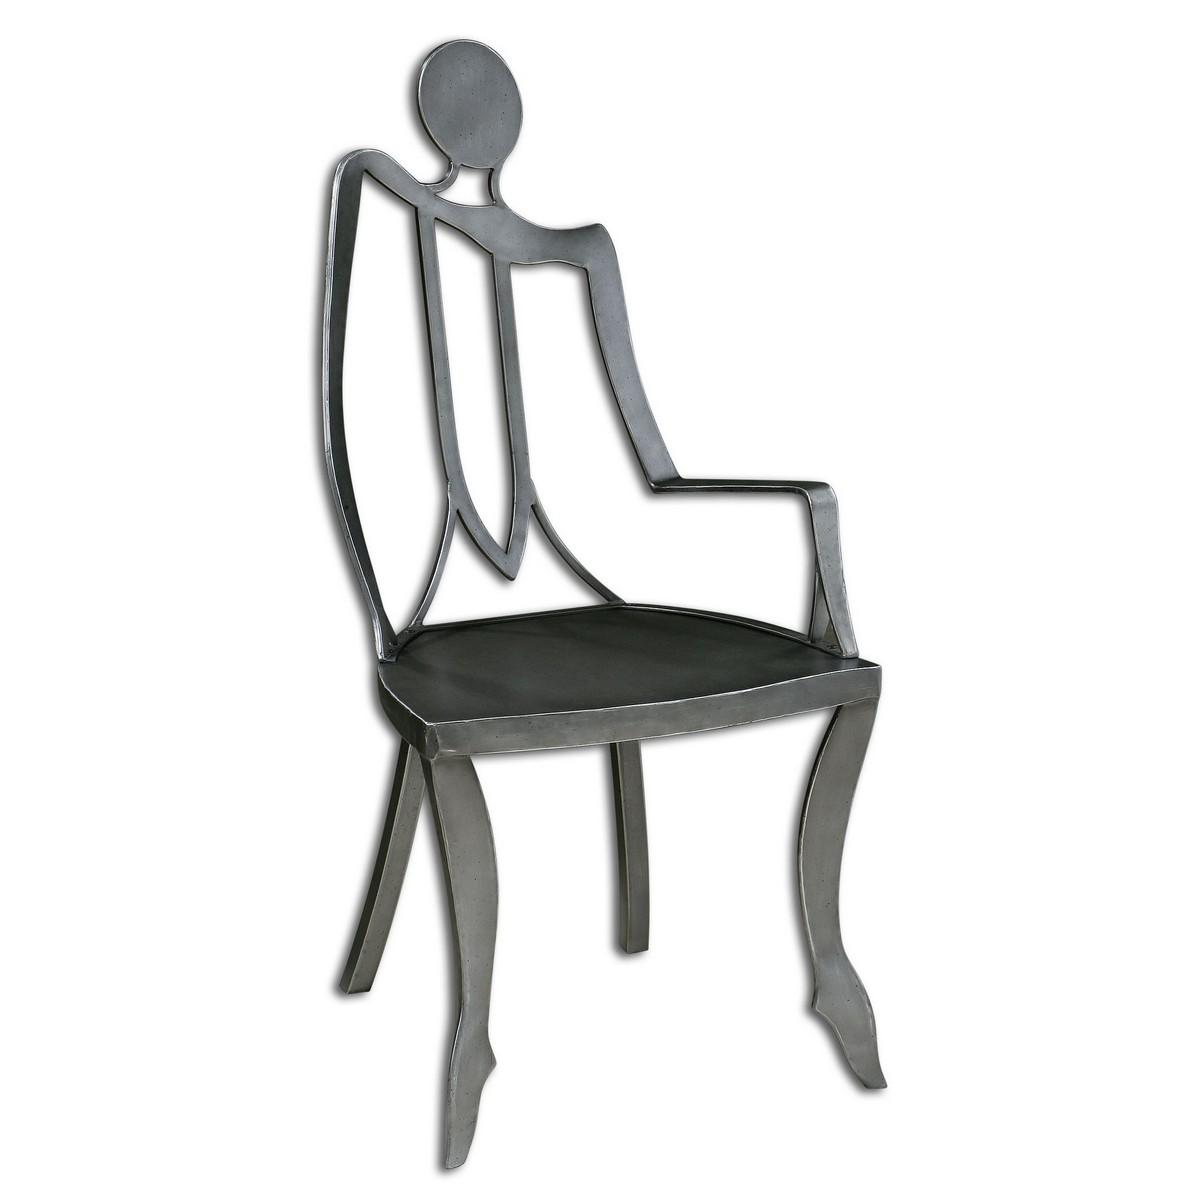 Uttermost Lena Left Accent Chair